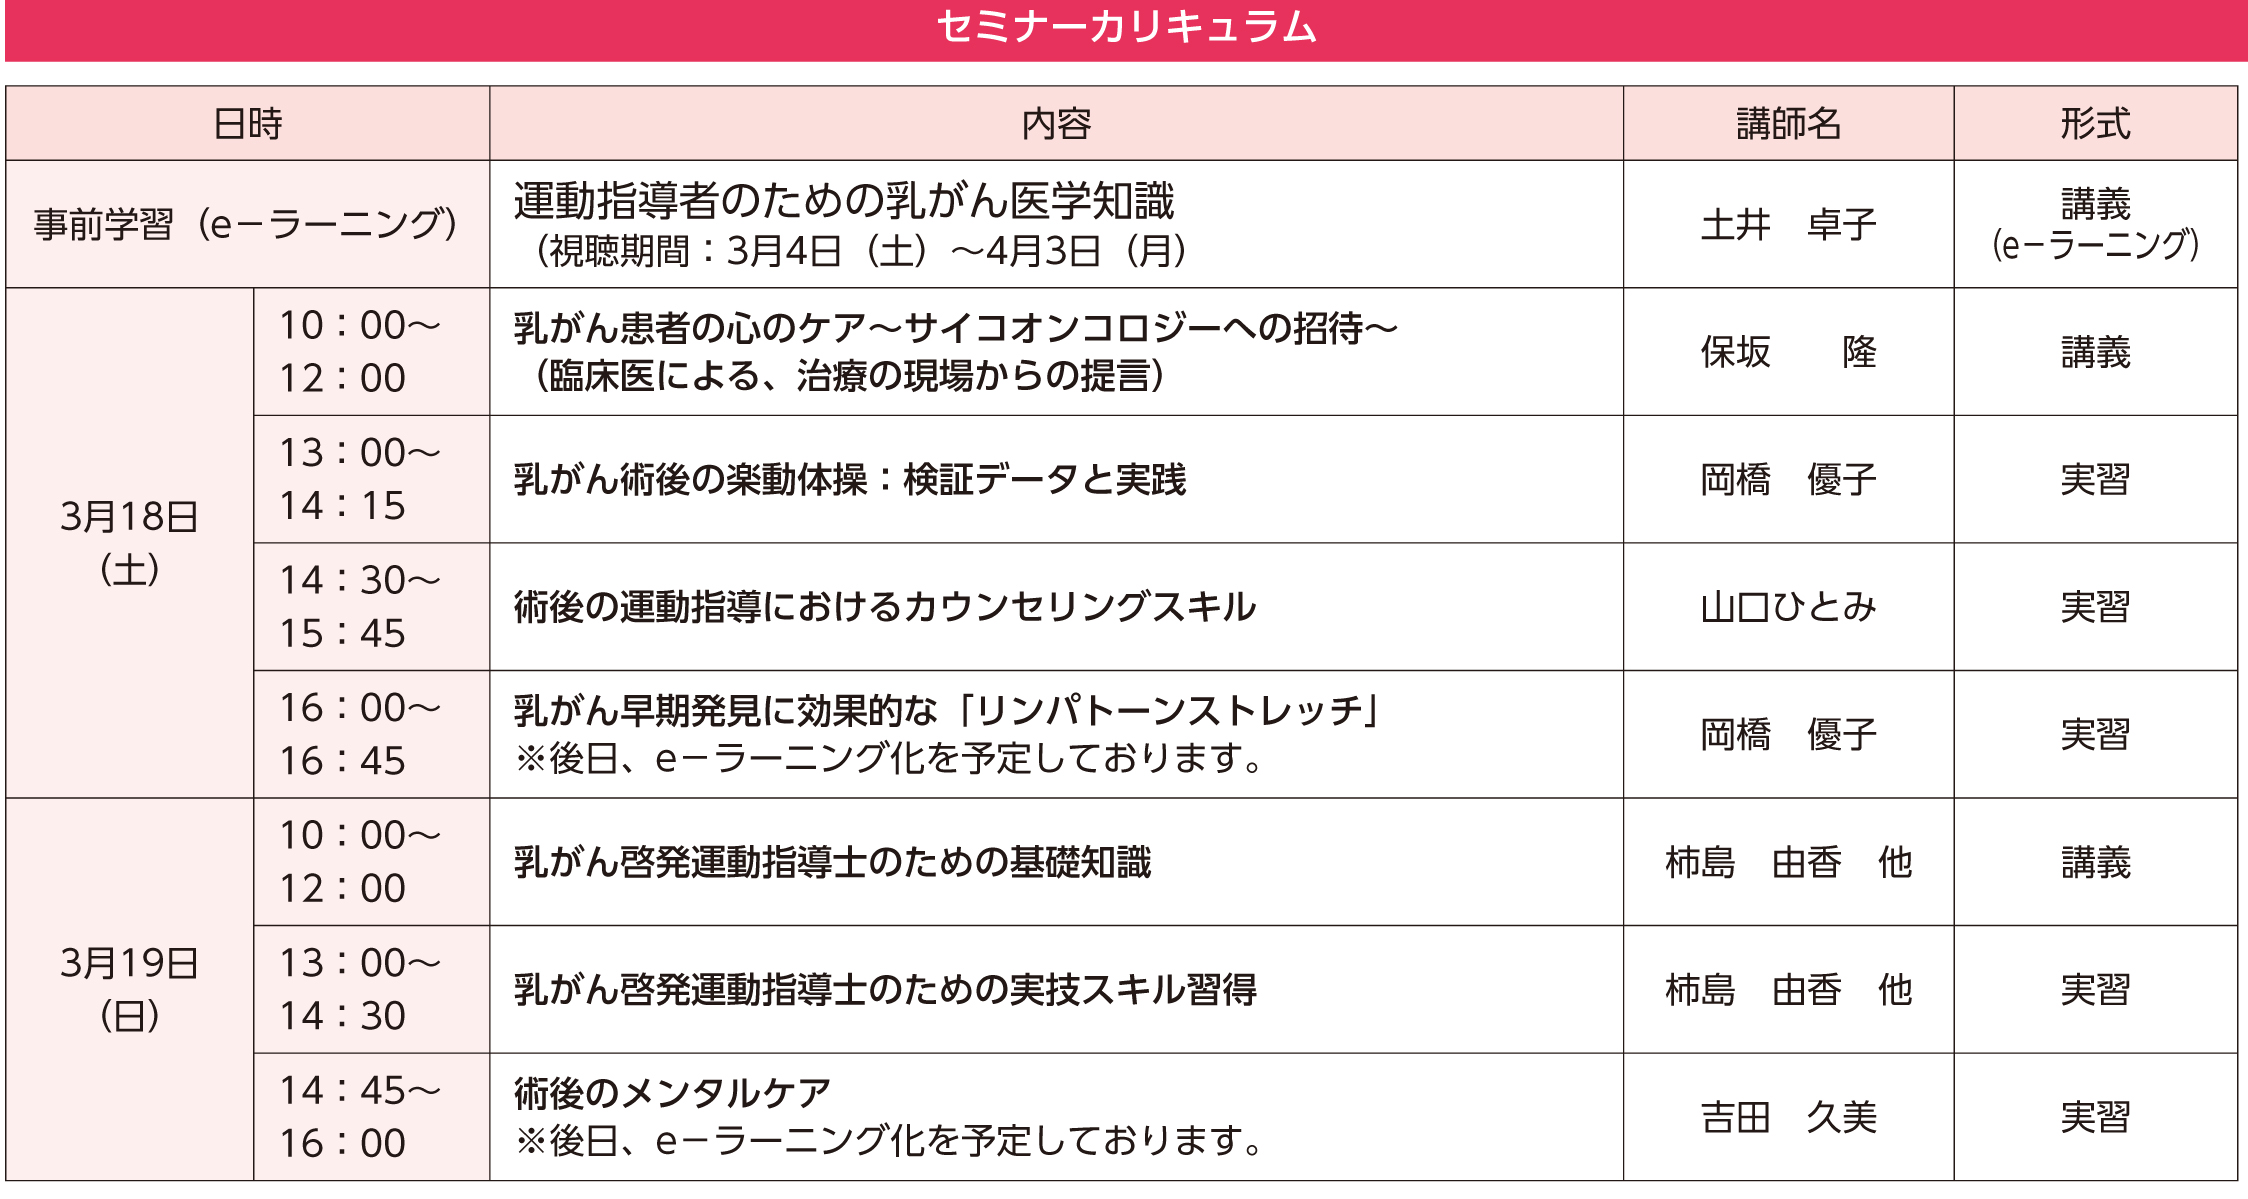 http://www.jafanet.jp/event/244%E6%9D%B1%E4%BA%AC%E3%82%BF%E3%82%A4%E3%83%A0%E3%83%86%E3%83%BC%E3%83%96%E3%83%AB.jpg